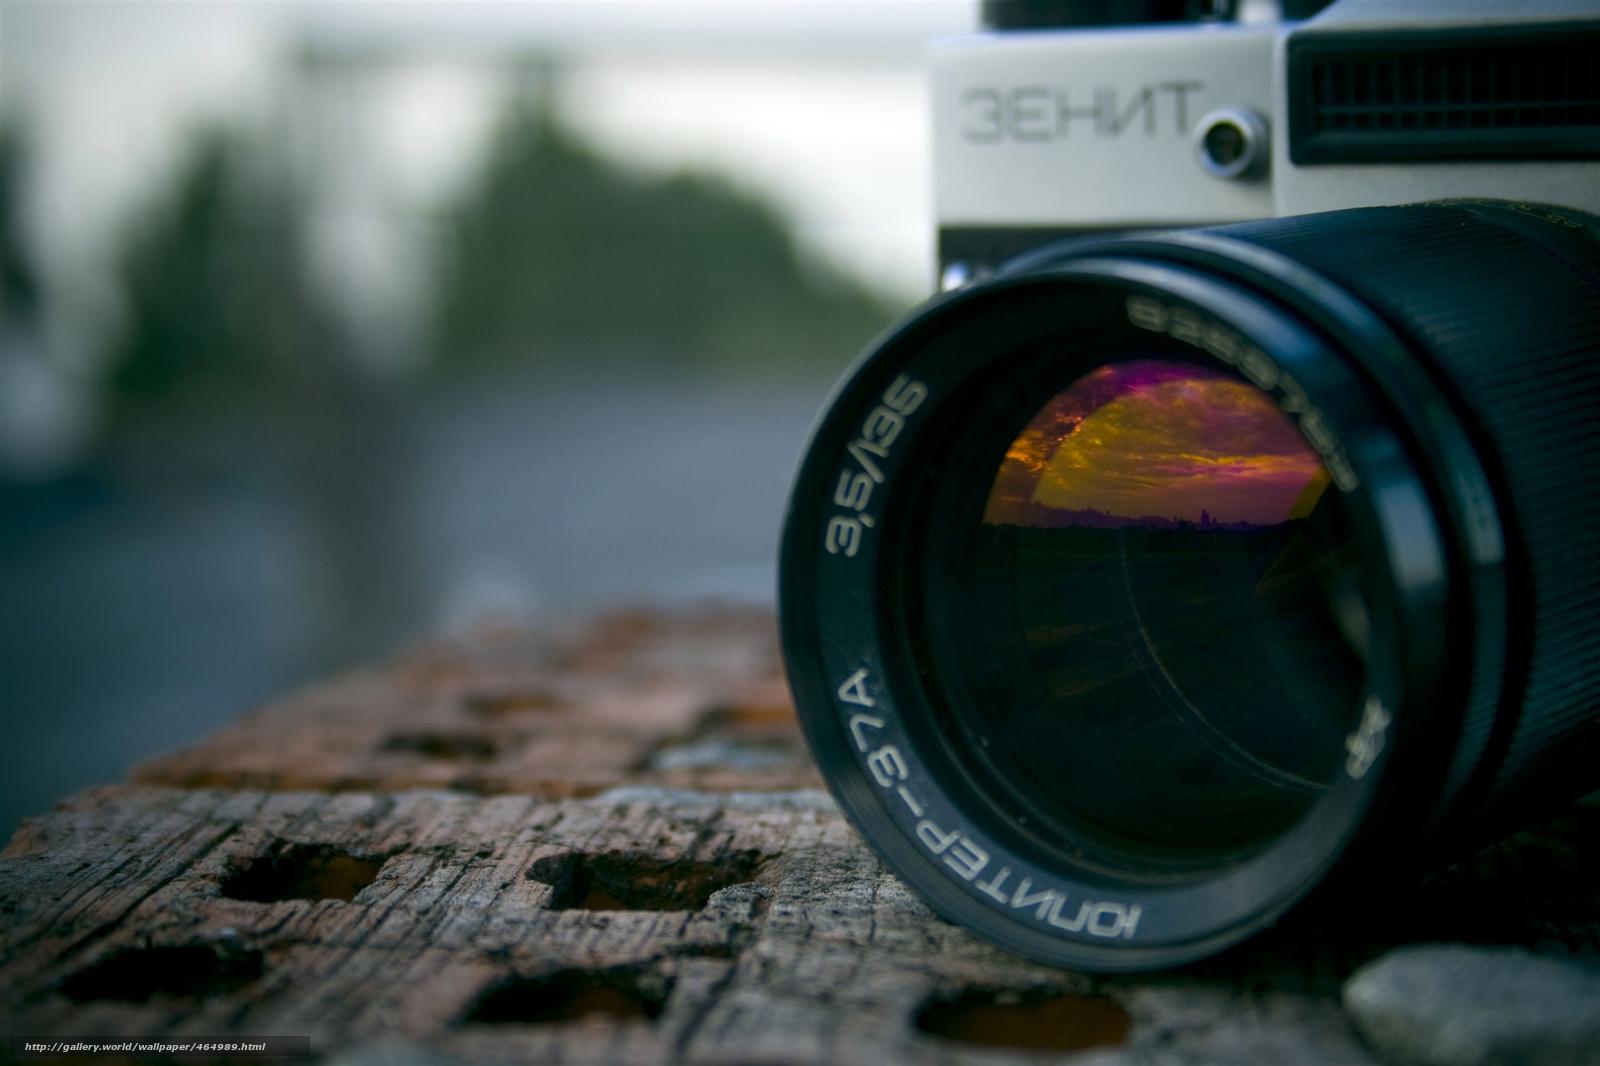 Tlcharger fond d 39 ecran appareil photo znith lentille for Ecran appareil photo